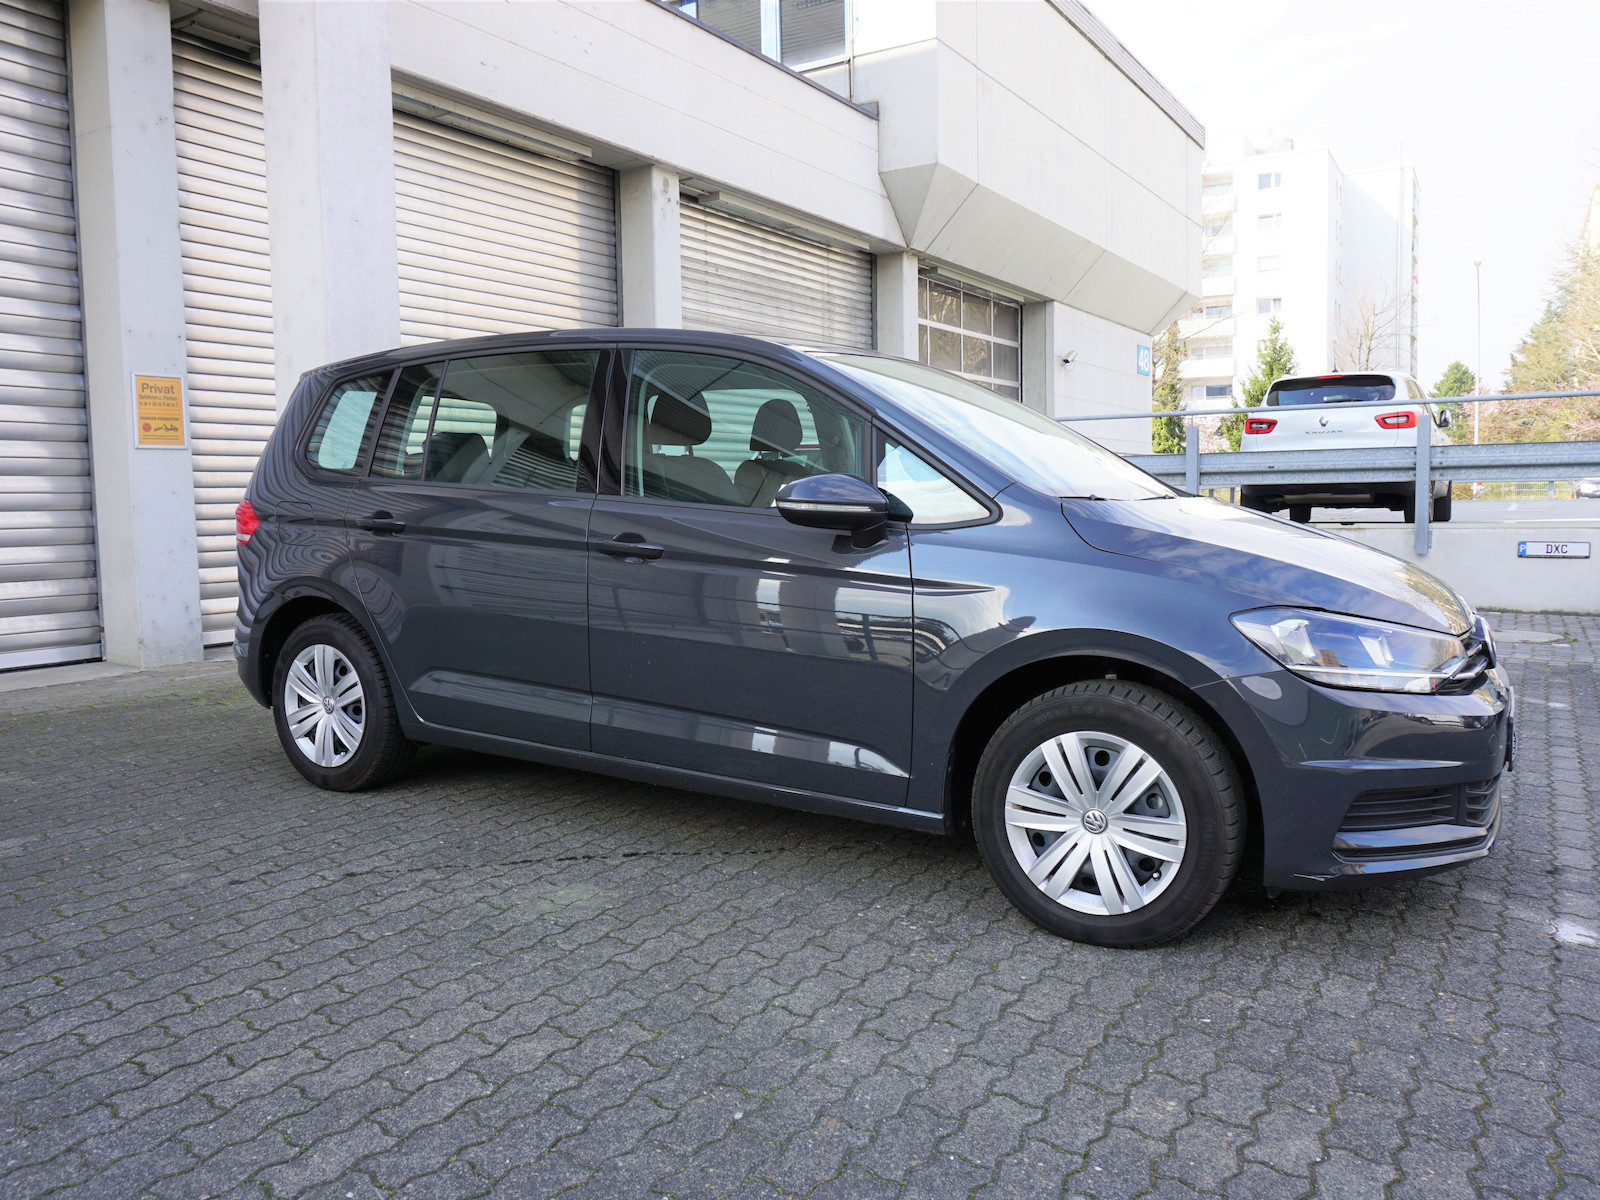 VW_Touran__3